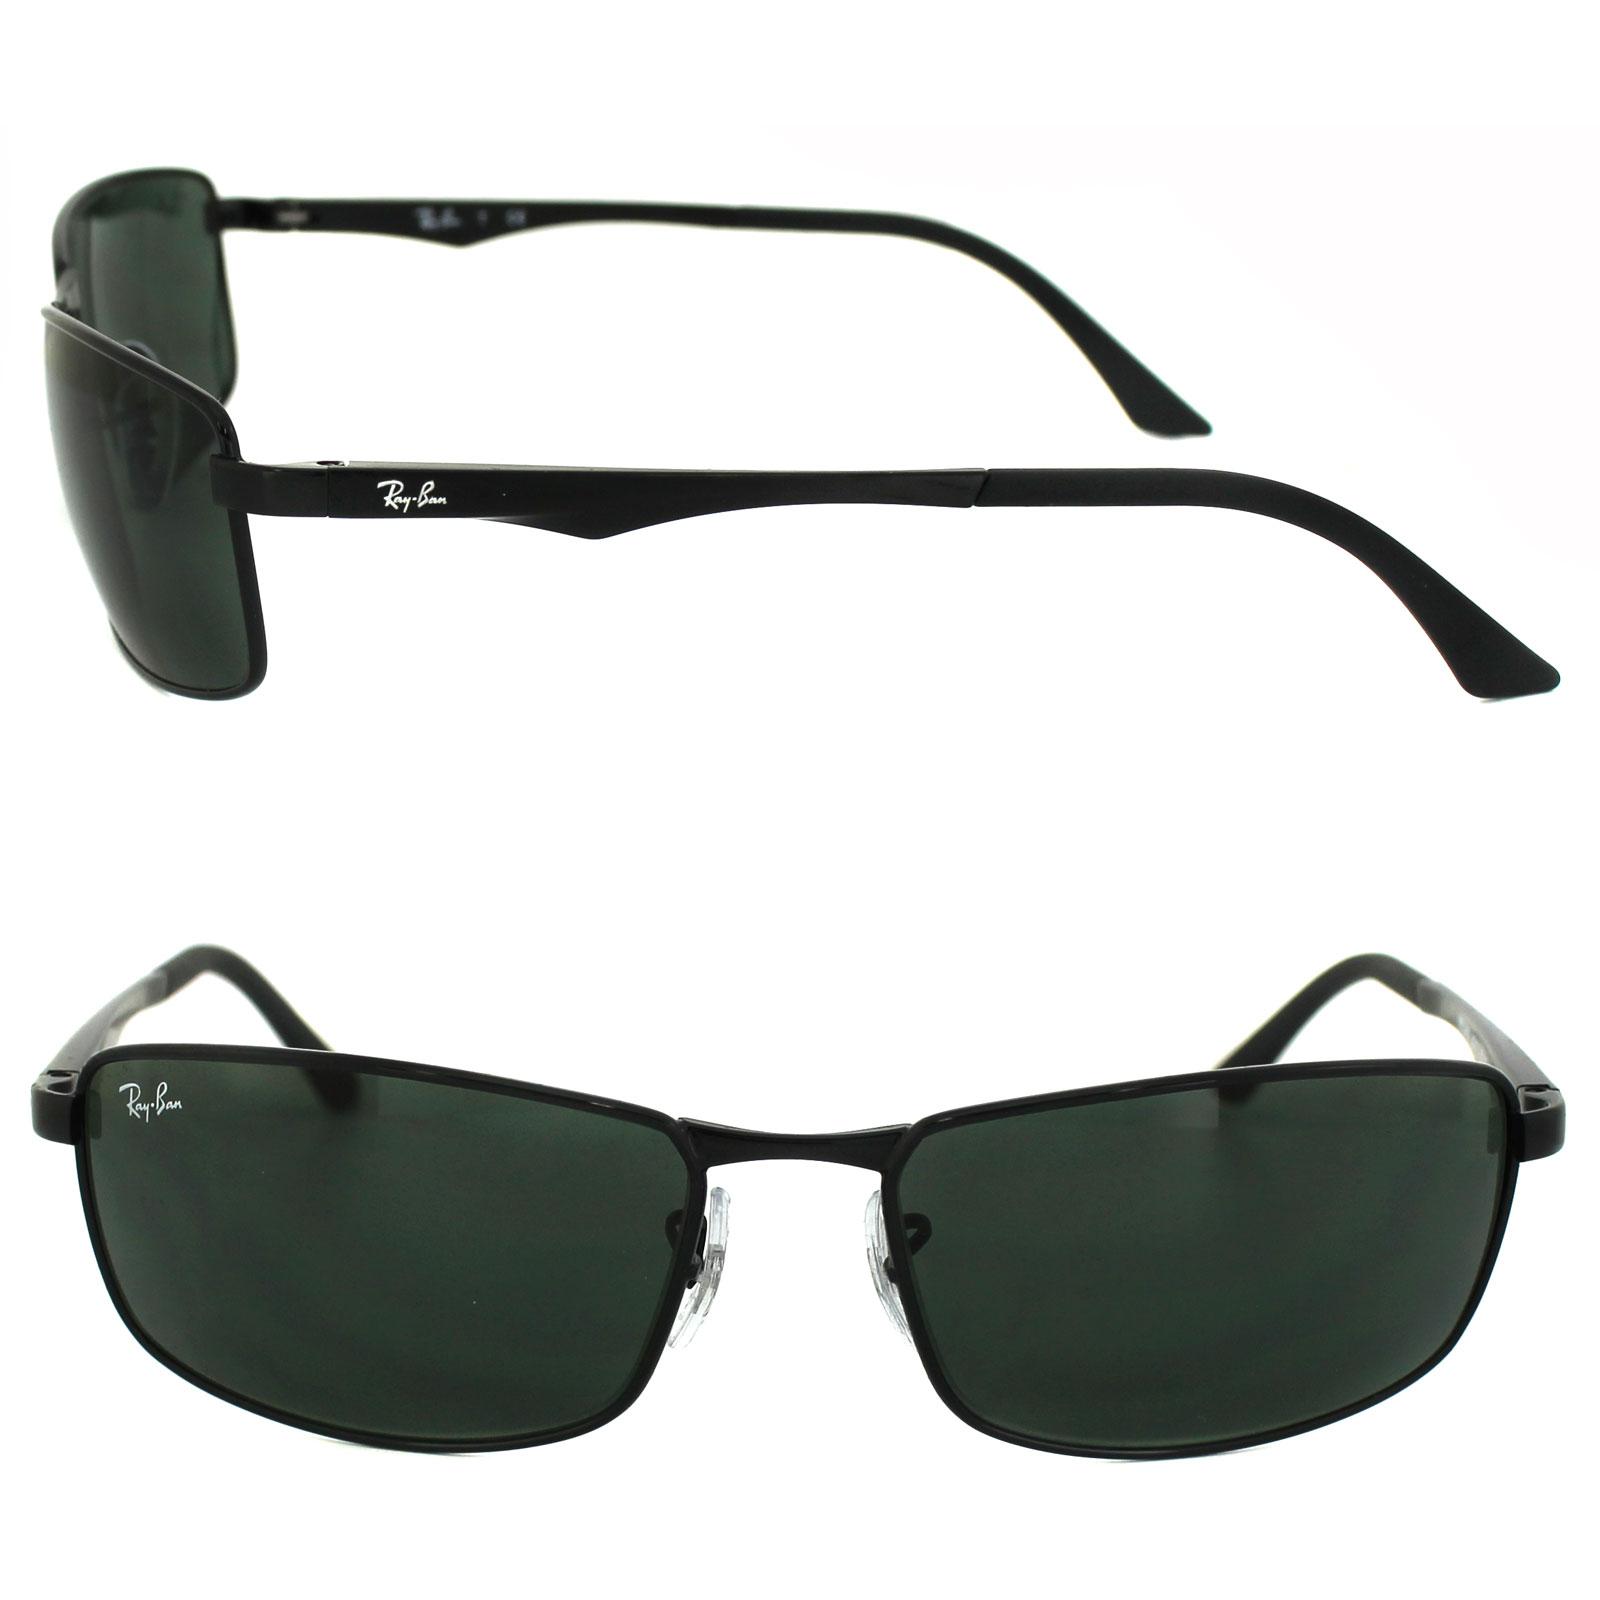 4eed2d66bc RayBan Sunglasses 3498 002 71 Black Green 713132572108